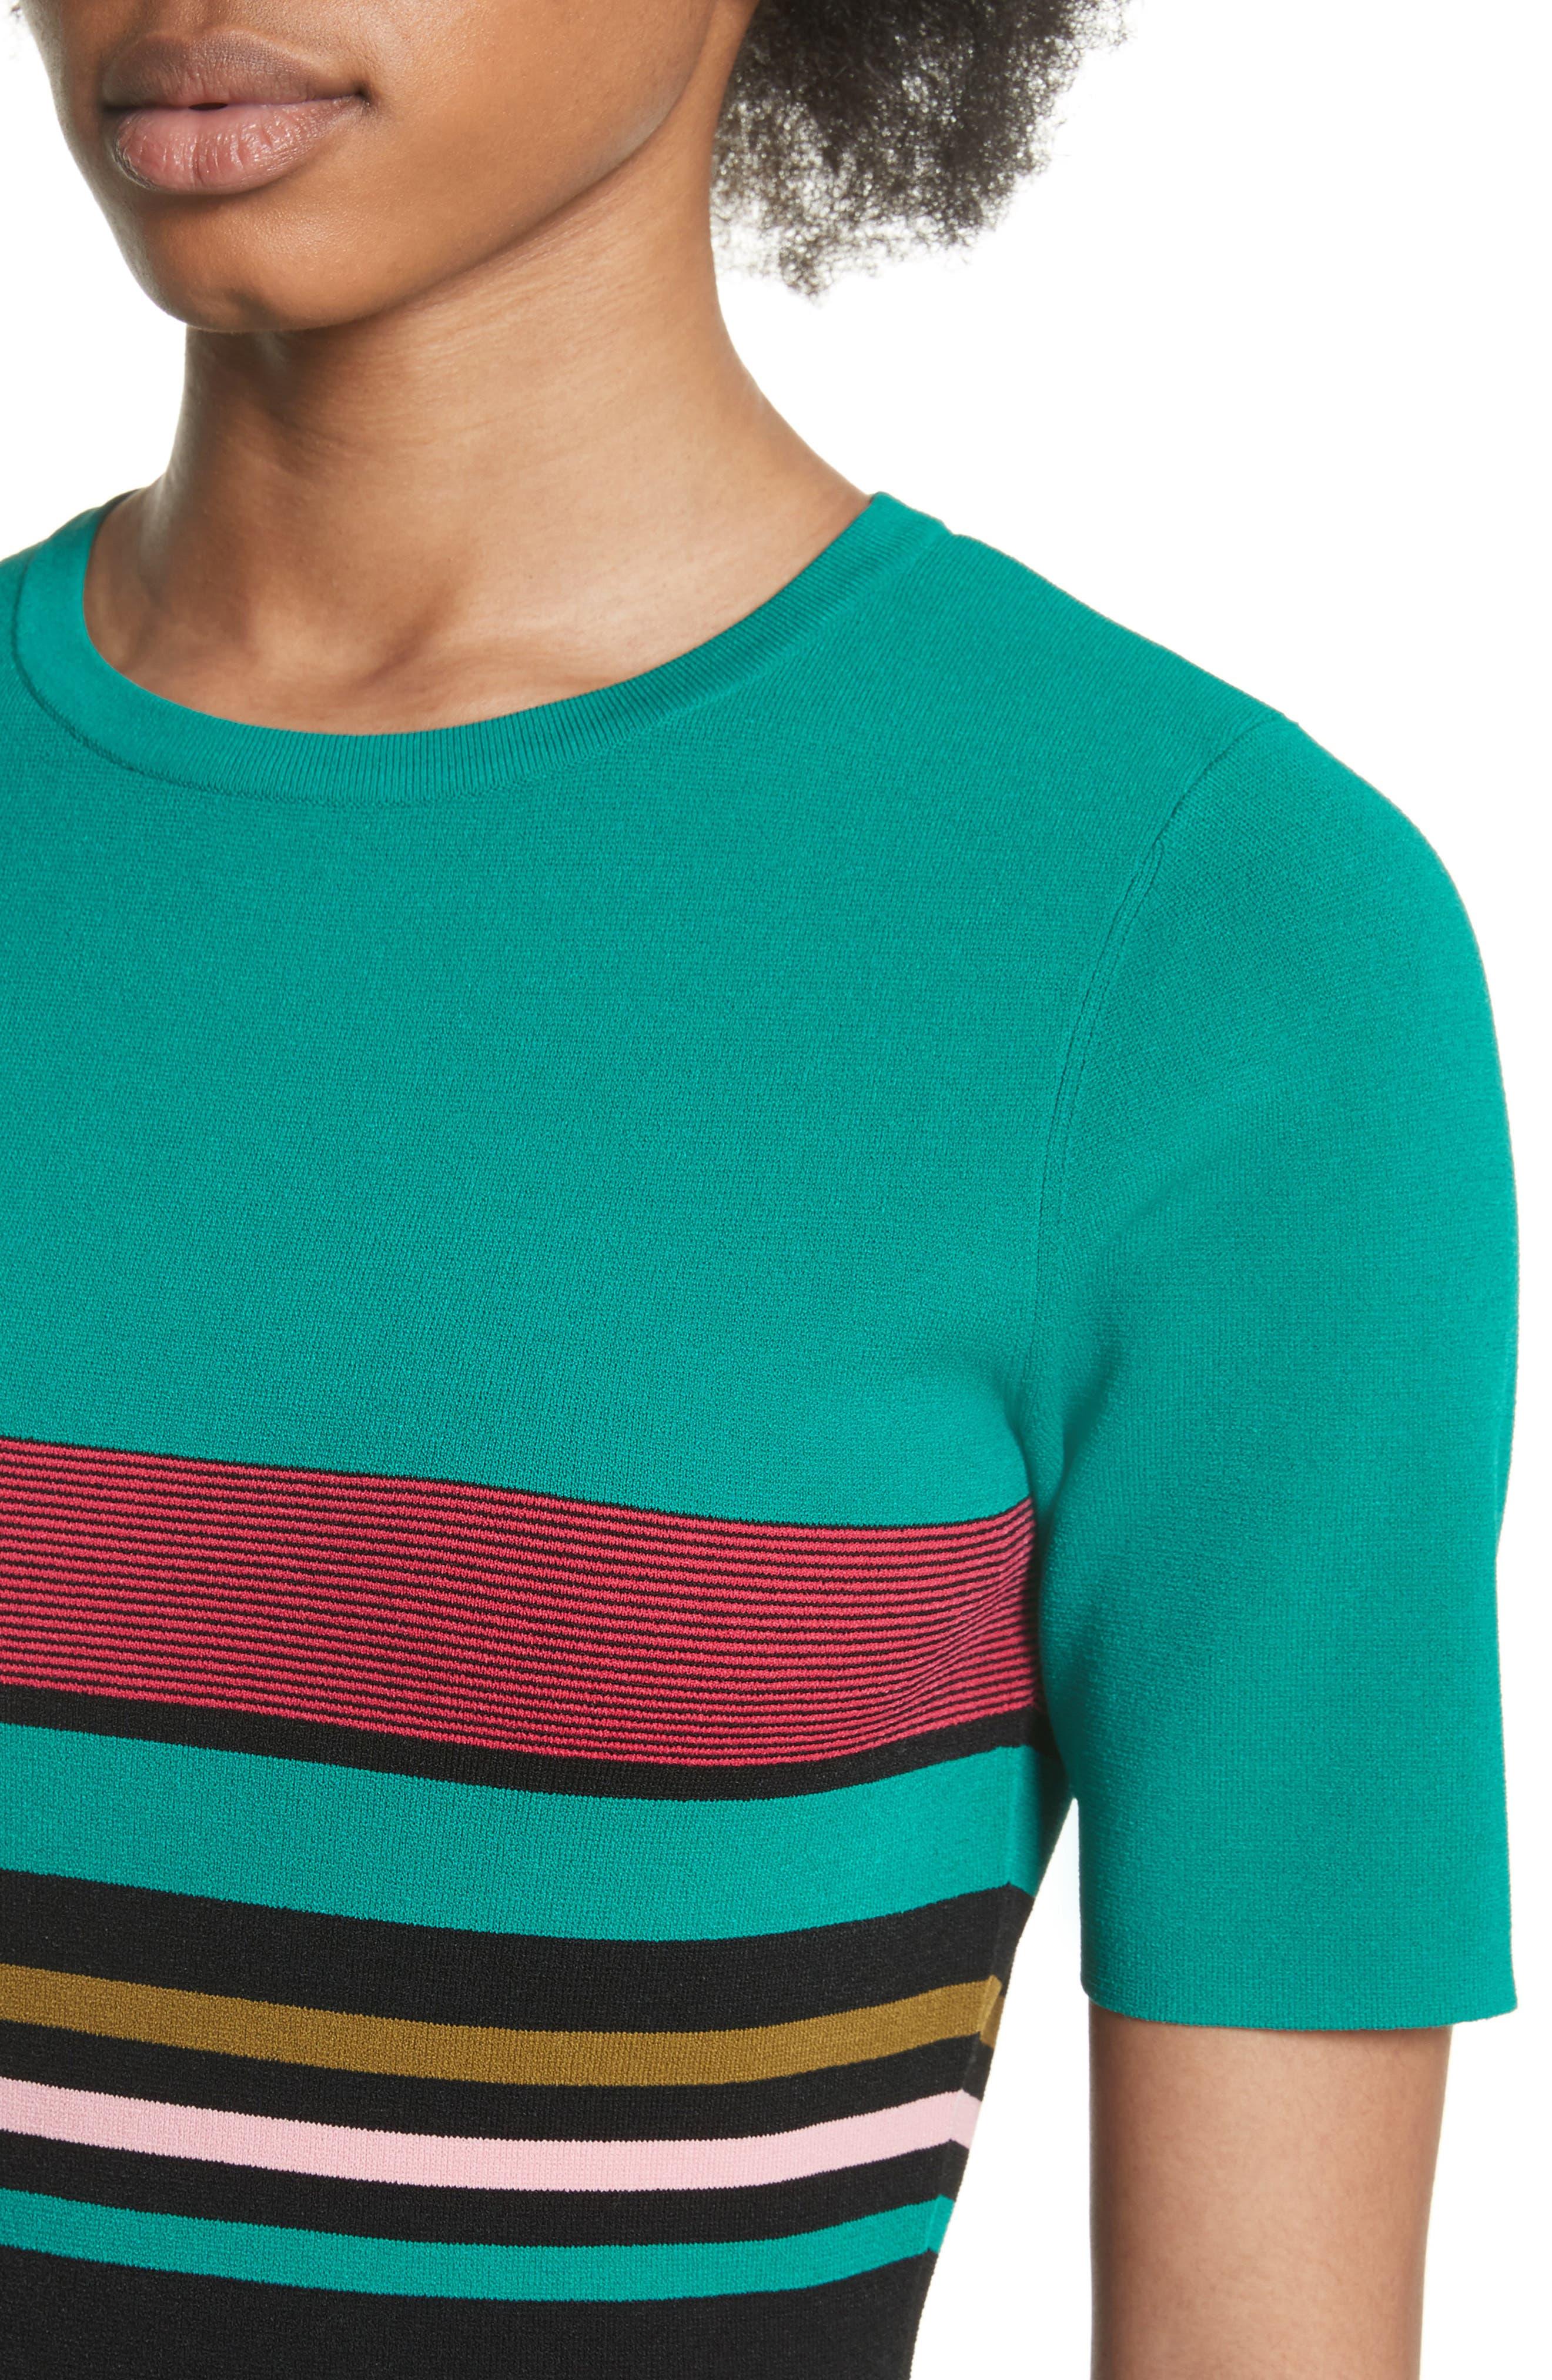 Diane von Furstenberg Stripe Short Sleeve Sweater Dress,                             Alternate thumbnail 4, color,                             386